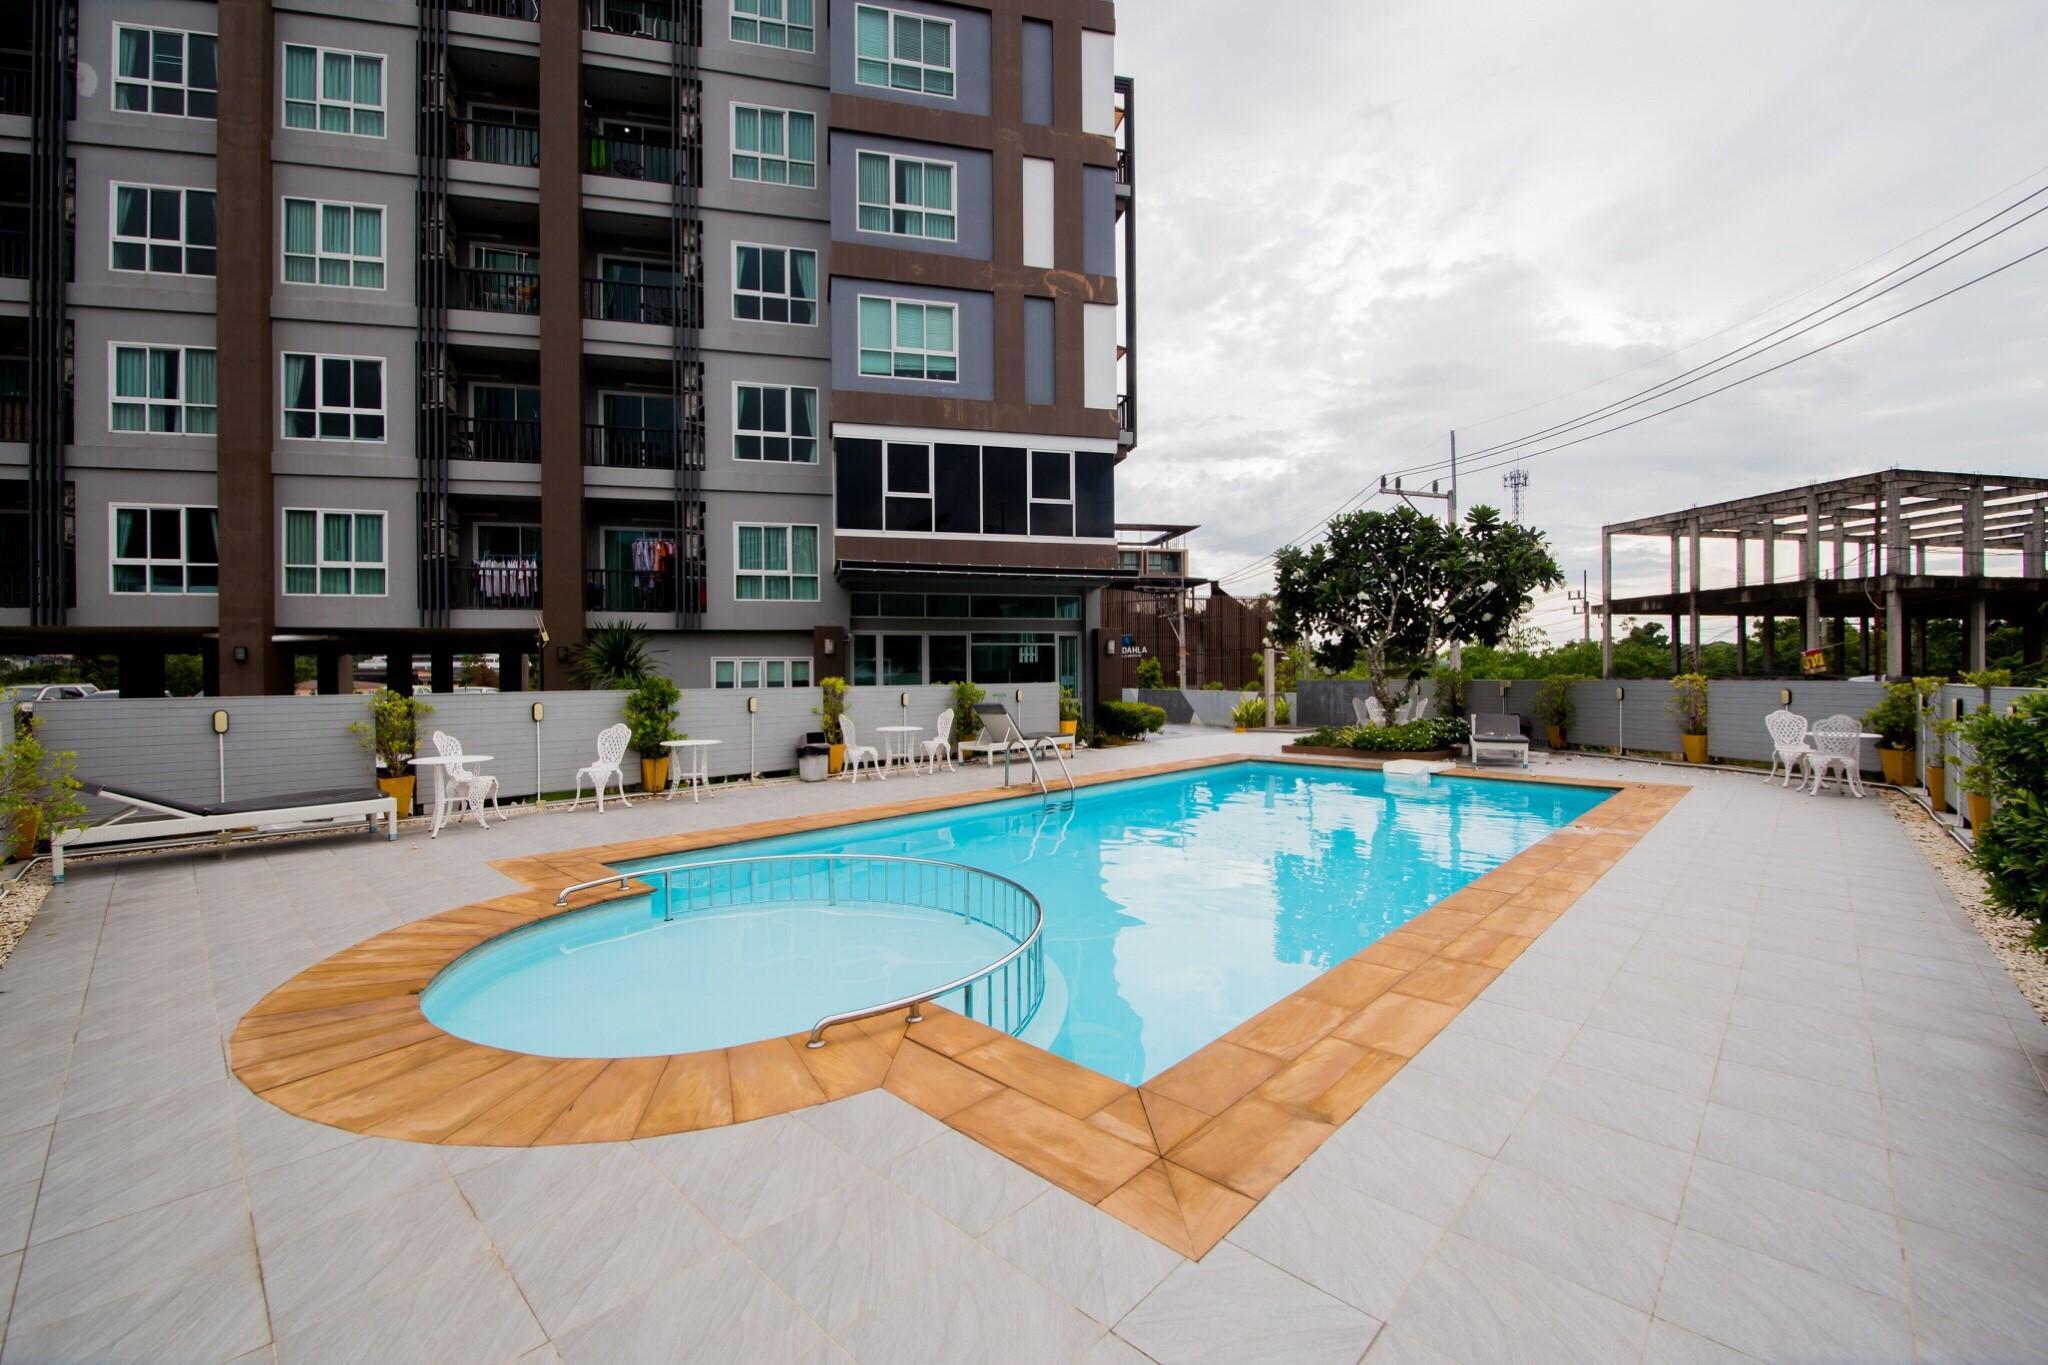 Aonang Ocean View Studio  - Pool & Fitness อพาร์ตเมนต์ 1 ห้องนอน 1 ห้องน้ำส่วนตัว ขนาด 33 ตร.ม. – อ่าวนาง